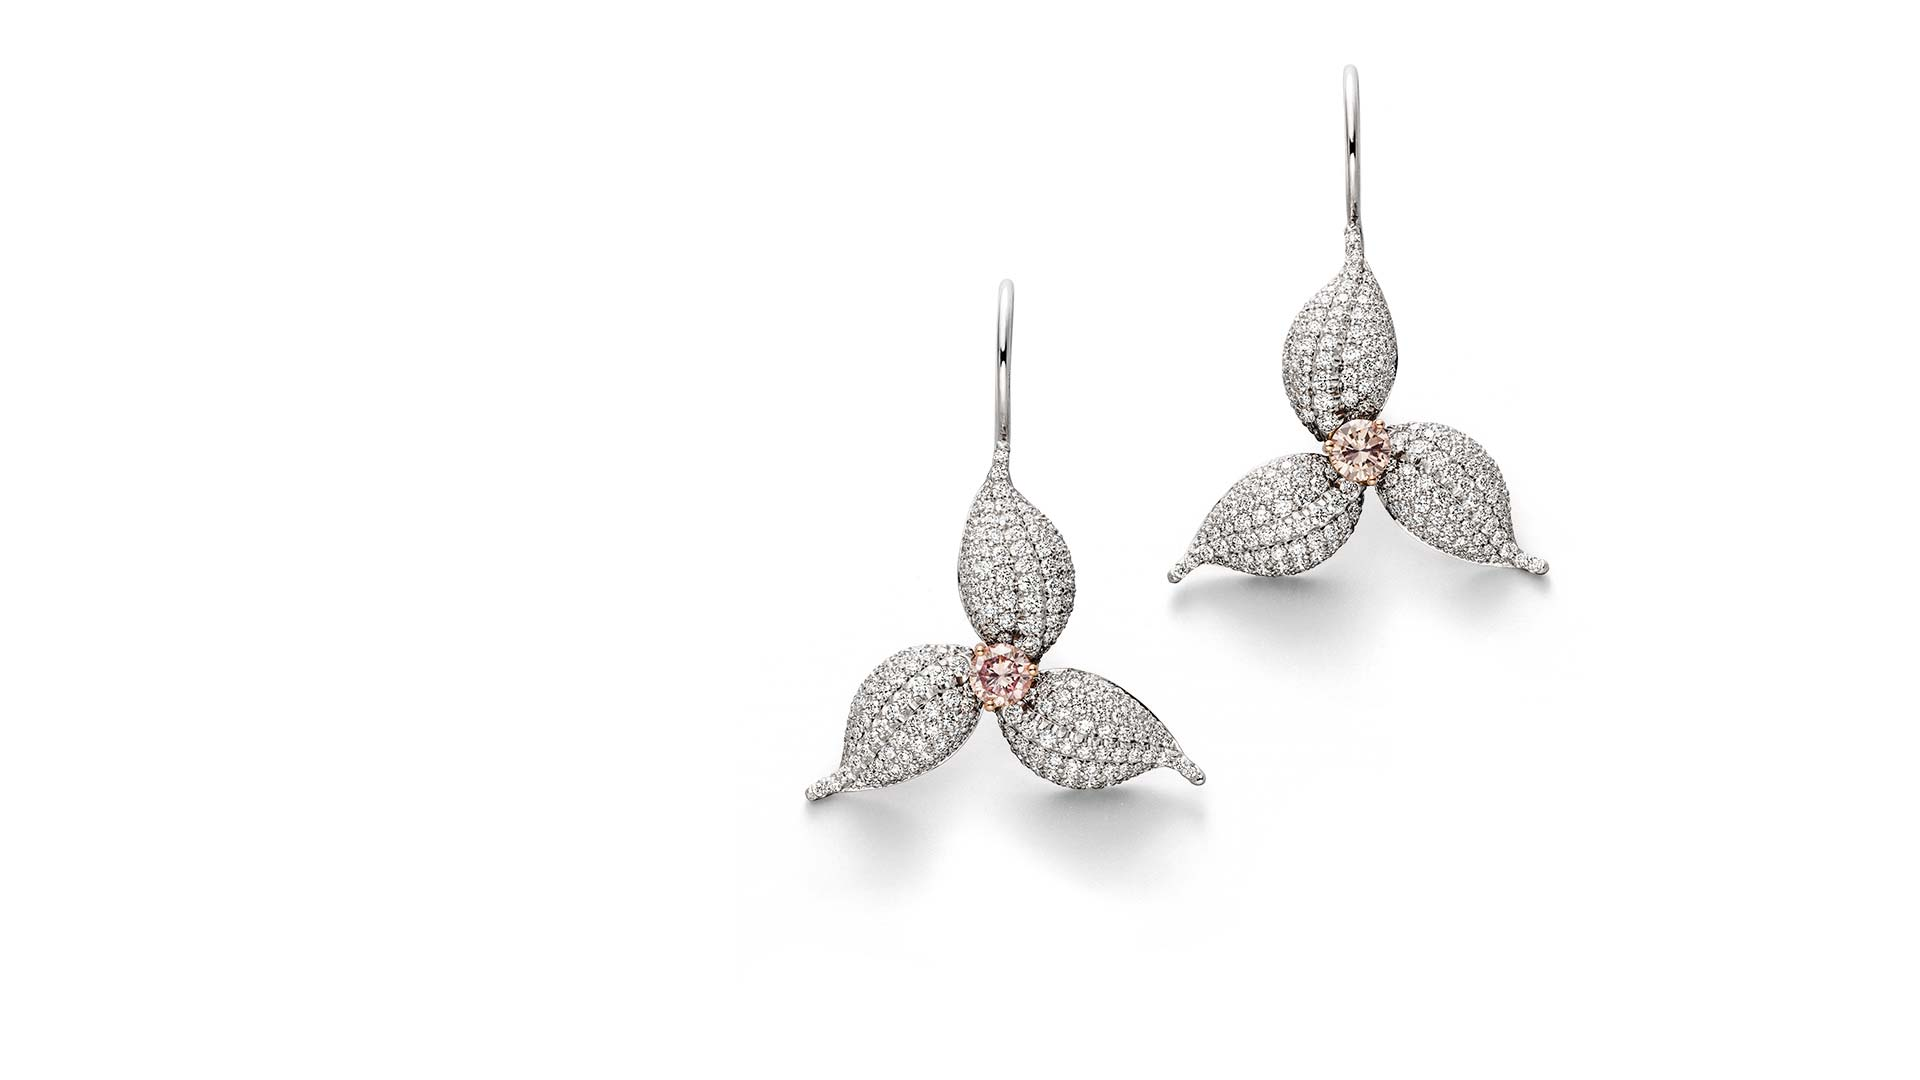 Platinum Diamond Earrings Tobias Ueberschaer Goldschmiedemeister Schmuck Unikate Edelsteine